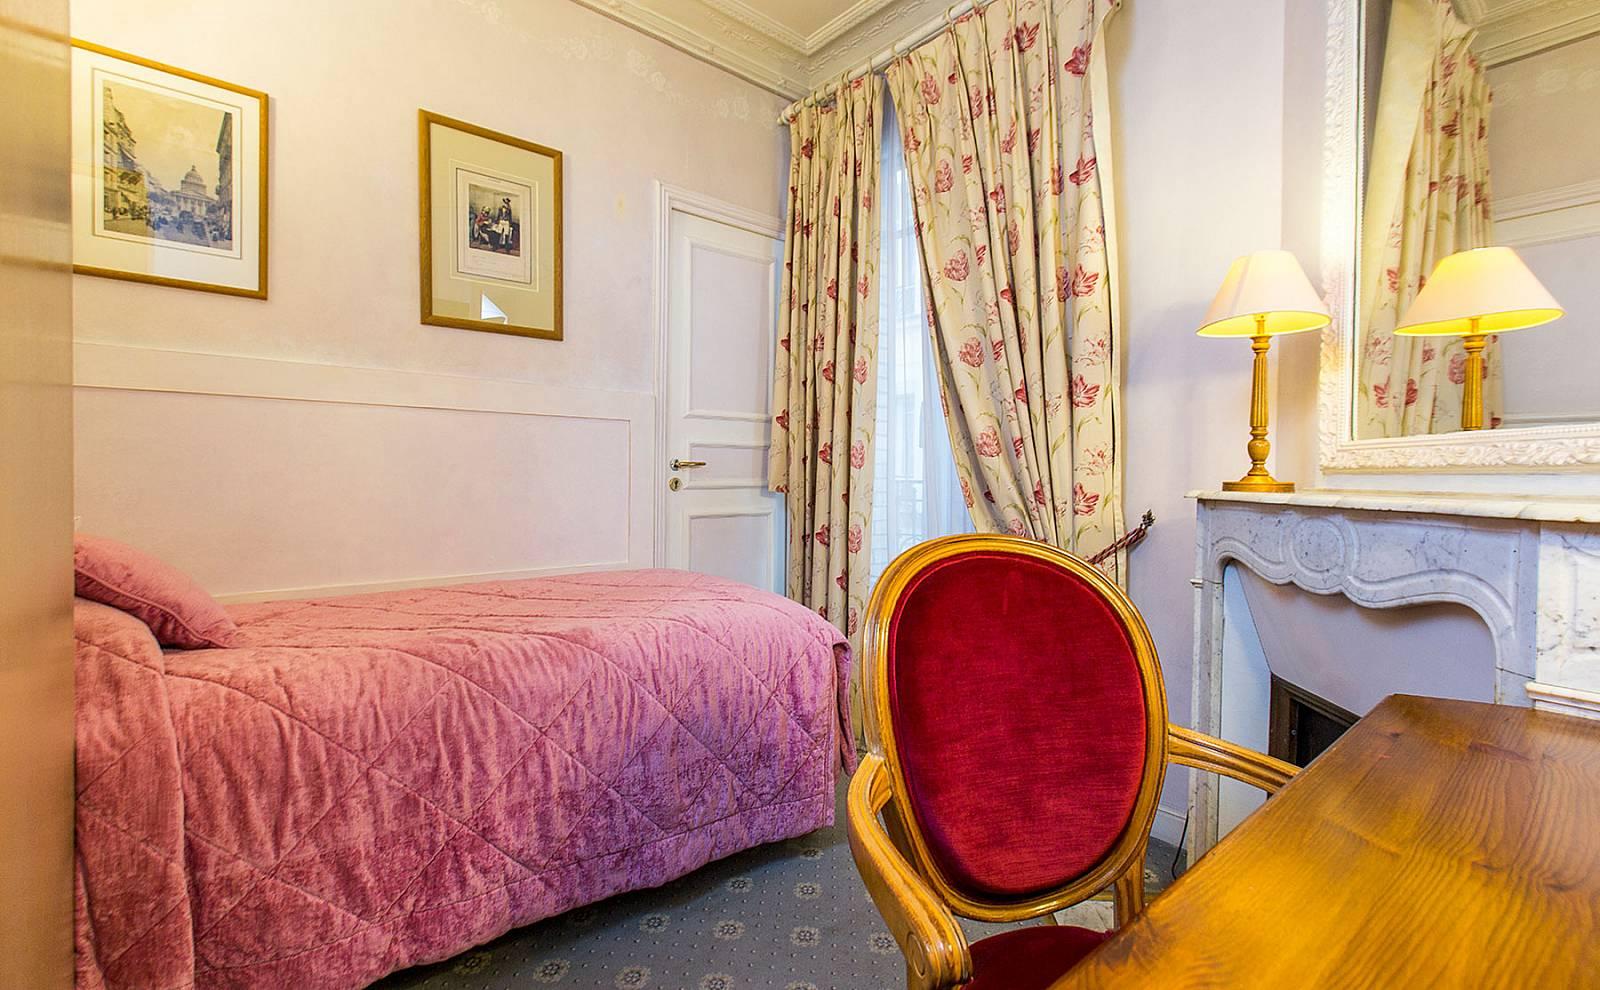 Chambre standard 1 personne hotel gavarni paris - Hotel paris chambre 5 personnes ...